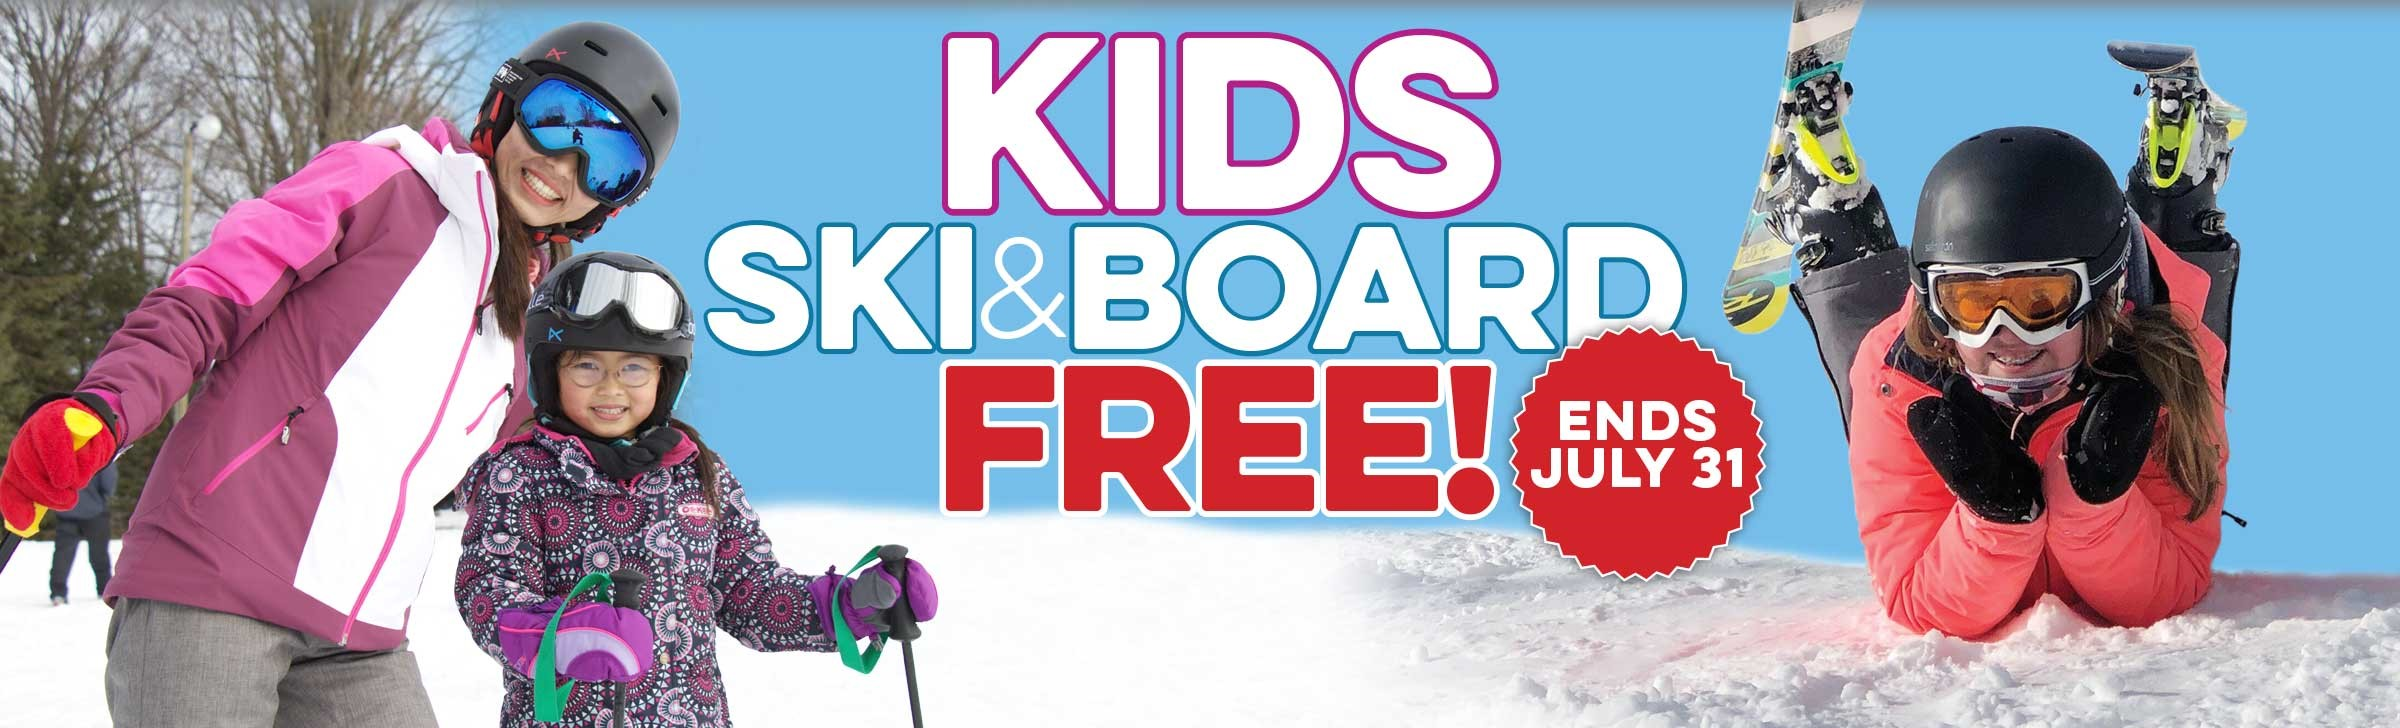 f1367931 Barrie Ontario Family Ski Area - Skiing, Snowboarding, Tubing